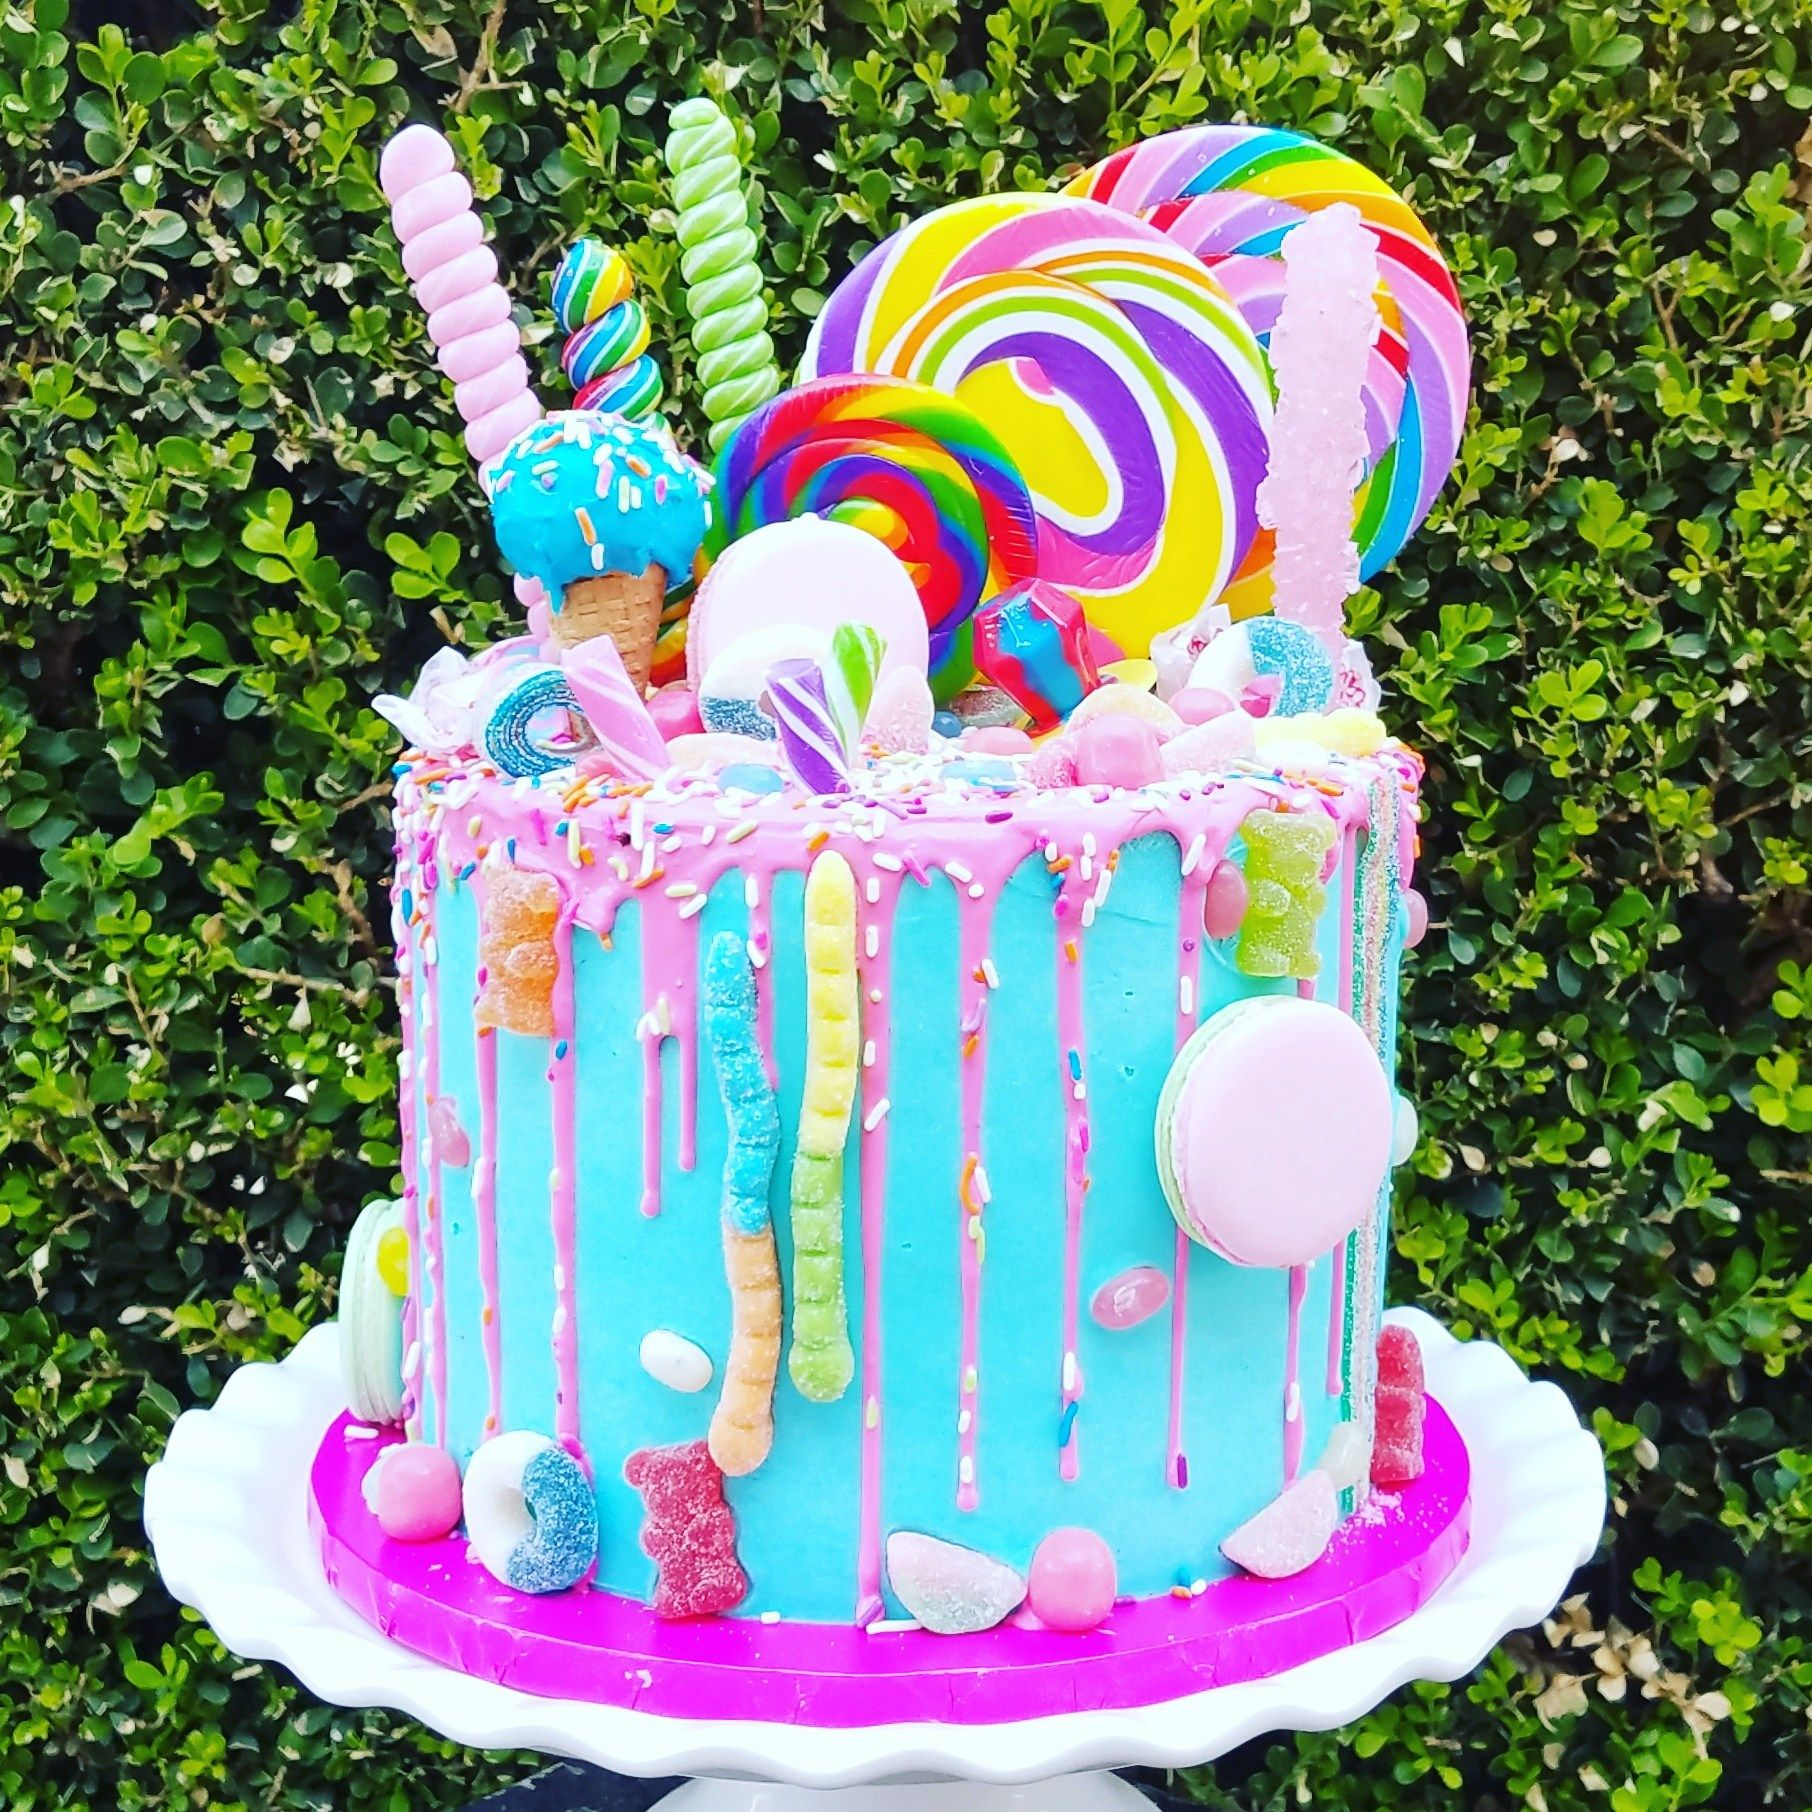 Enjoyable 32 Best Photo Of Candy Birthday Cake Candy Birthday Cakes Personalised Birthday Cards Paralily Jamesorg